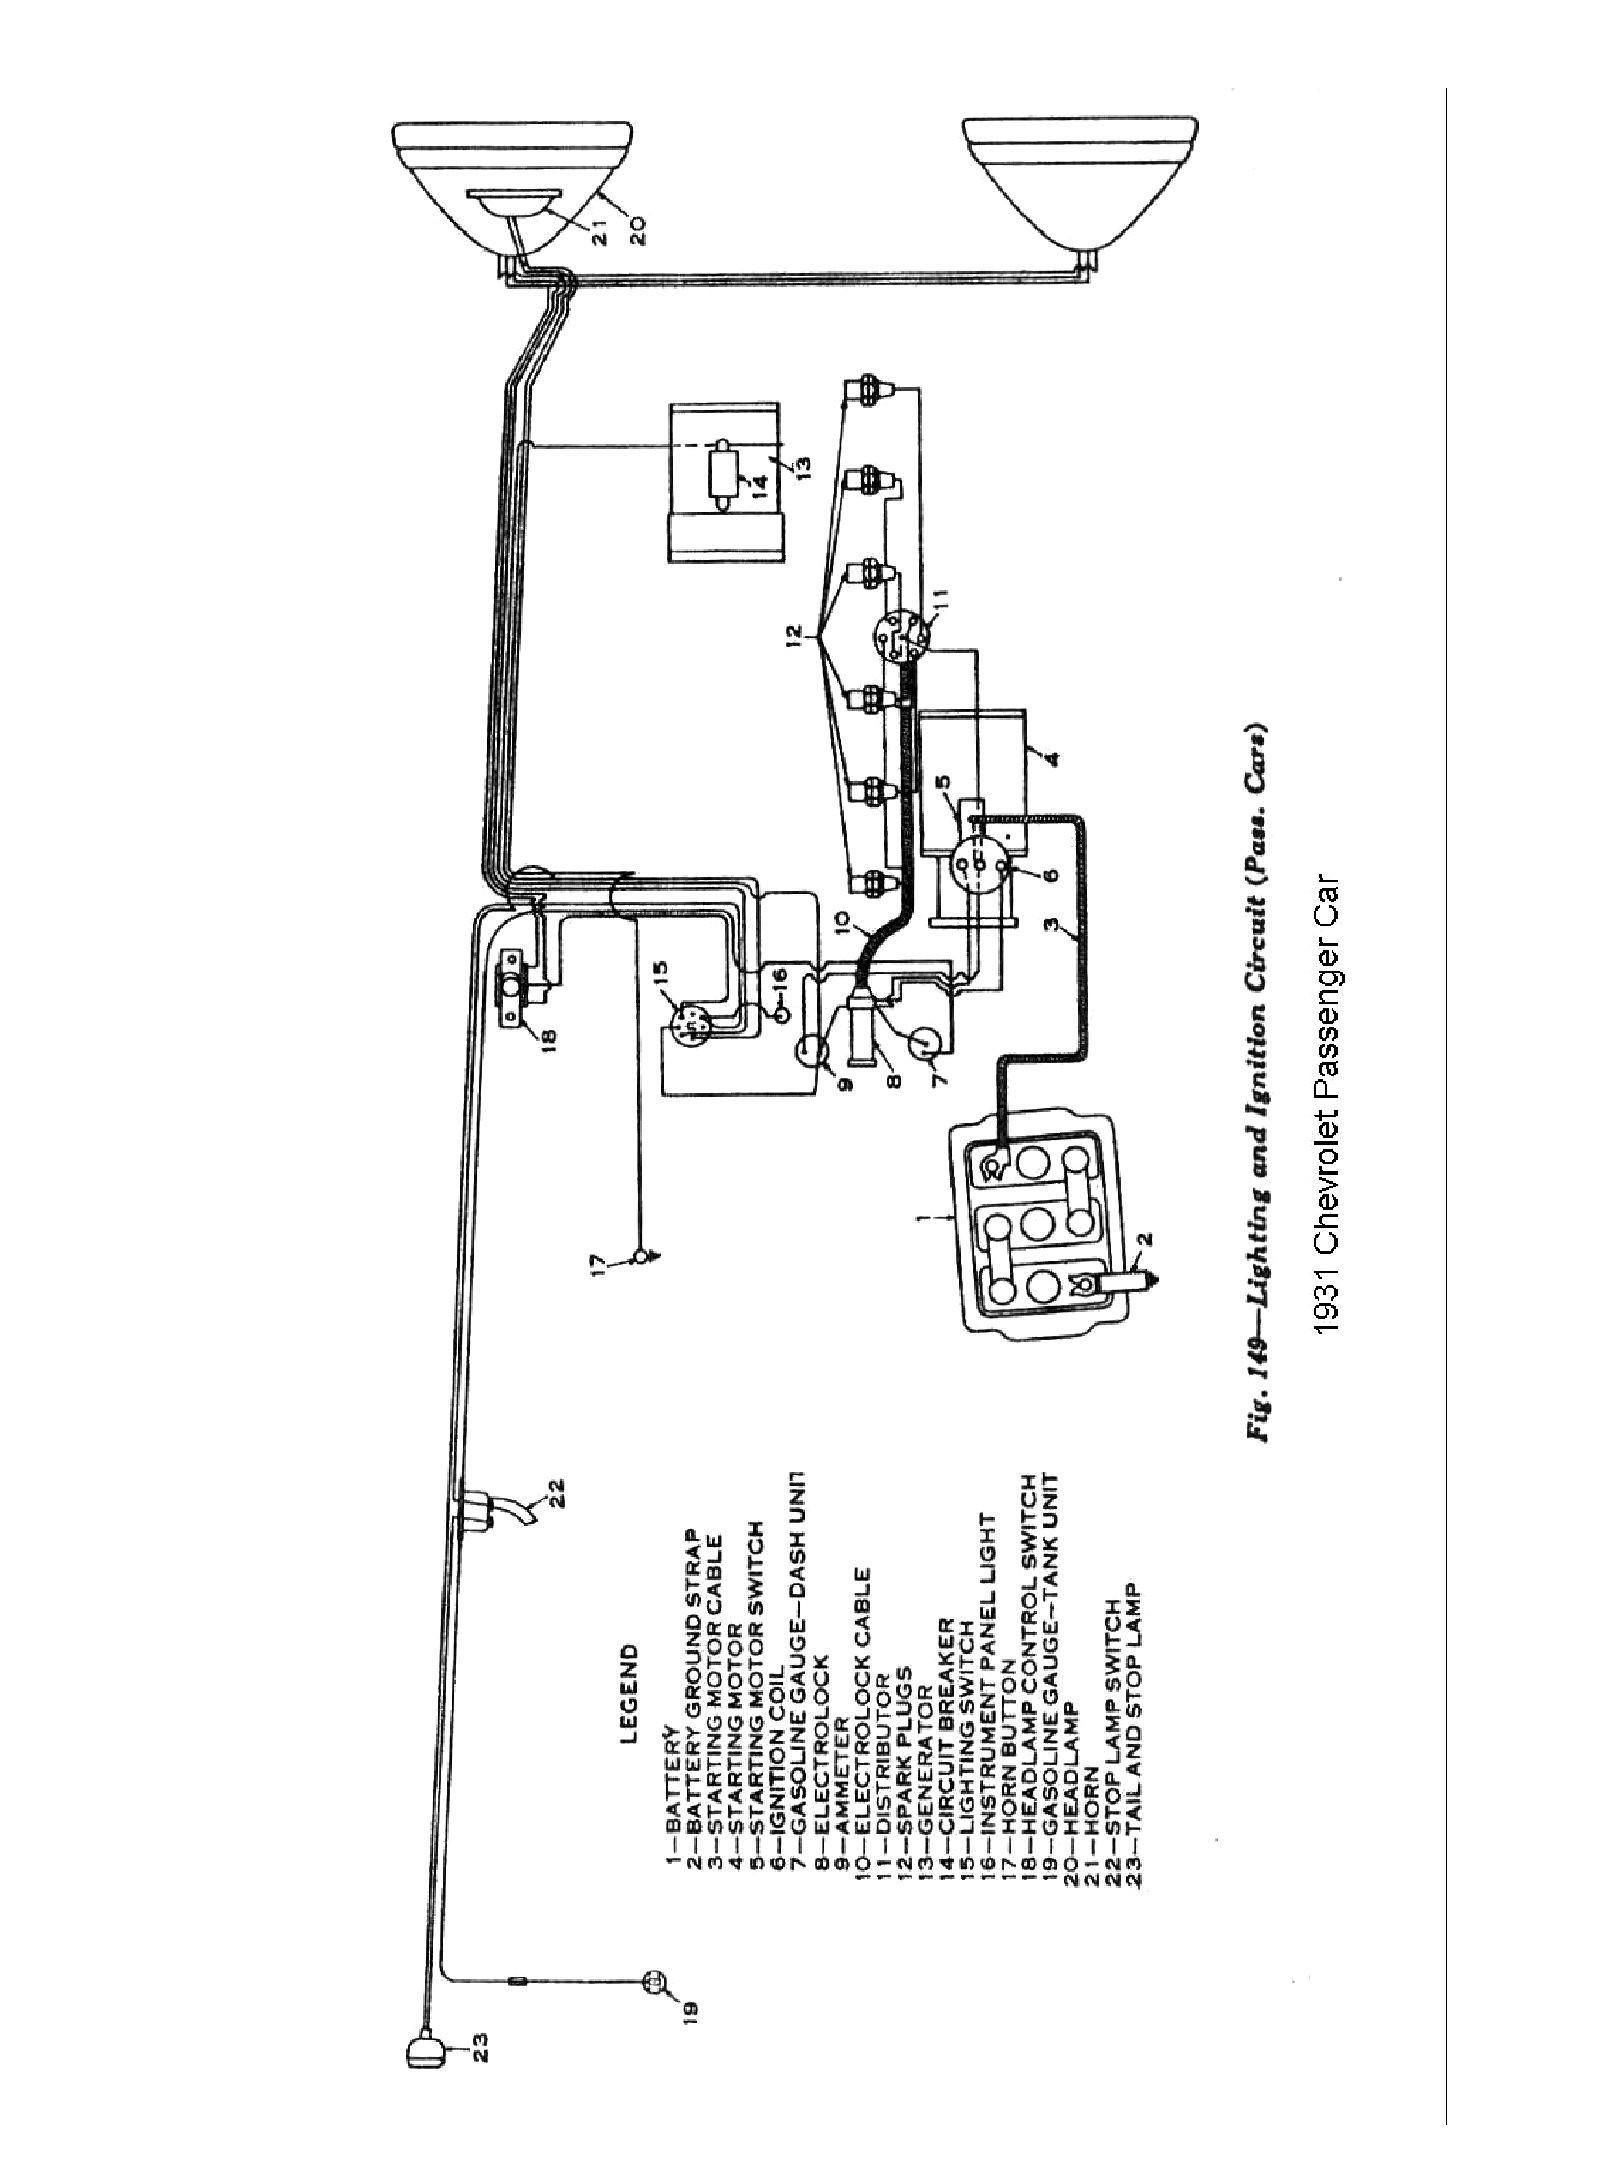 4 Prong Generator Plug Wiring Diagram Inspirational